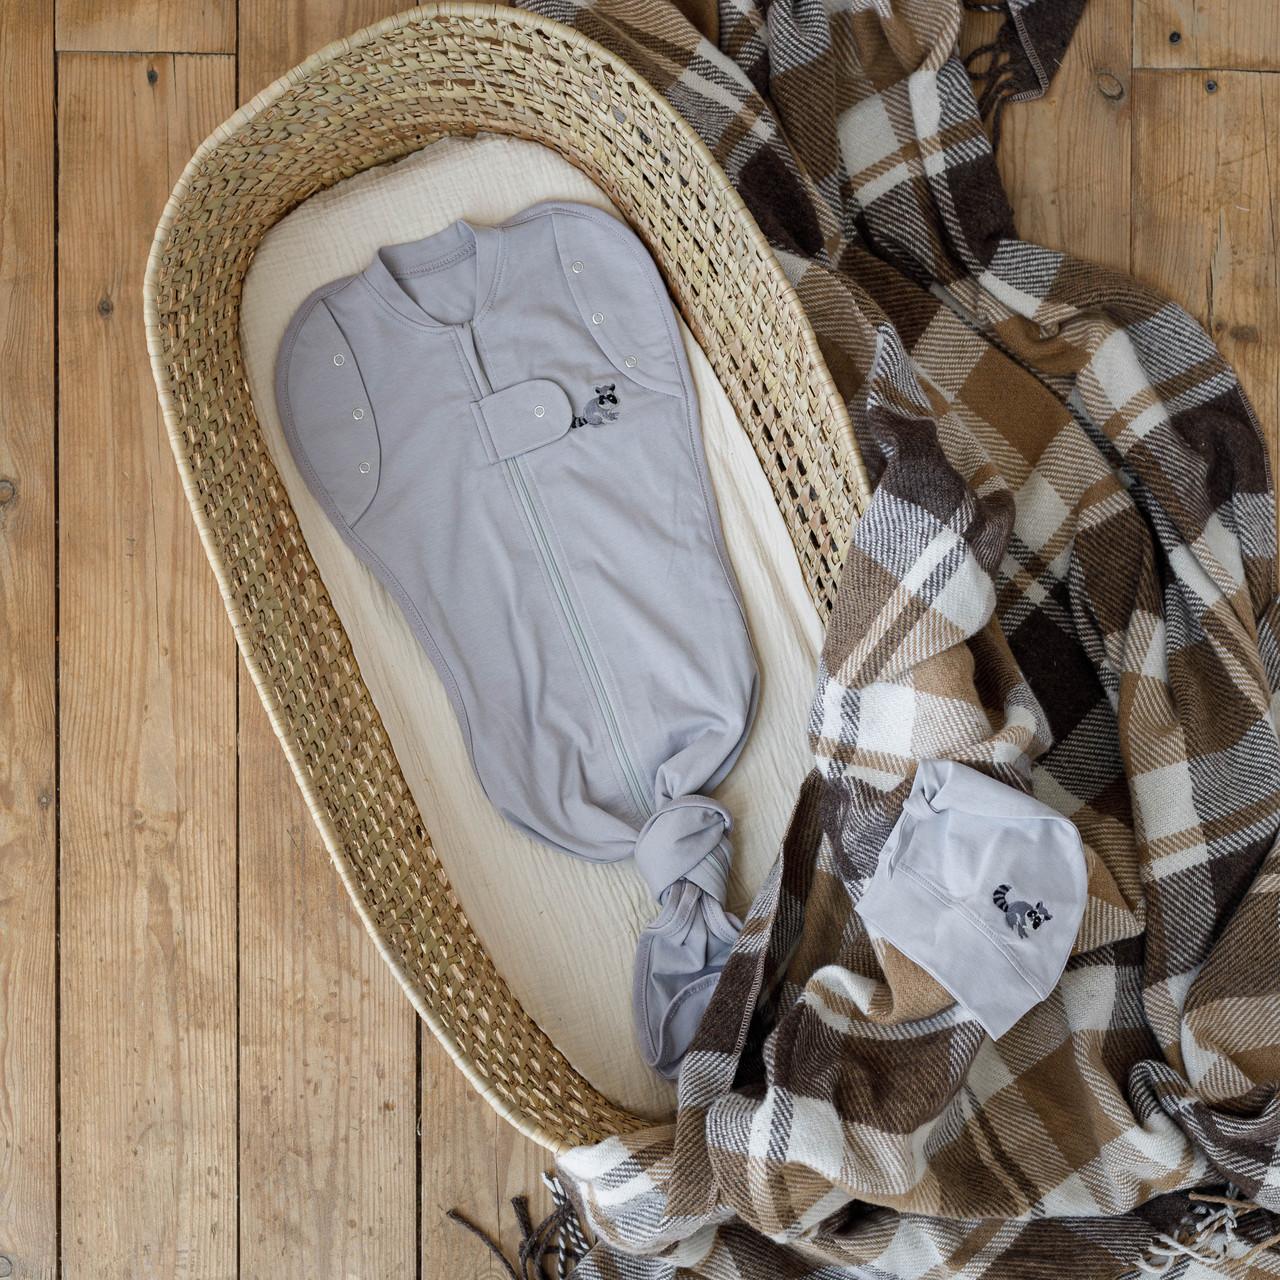 Безразмерная пеленка на молнии с шапочкой Каспер, Енот